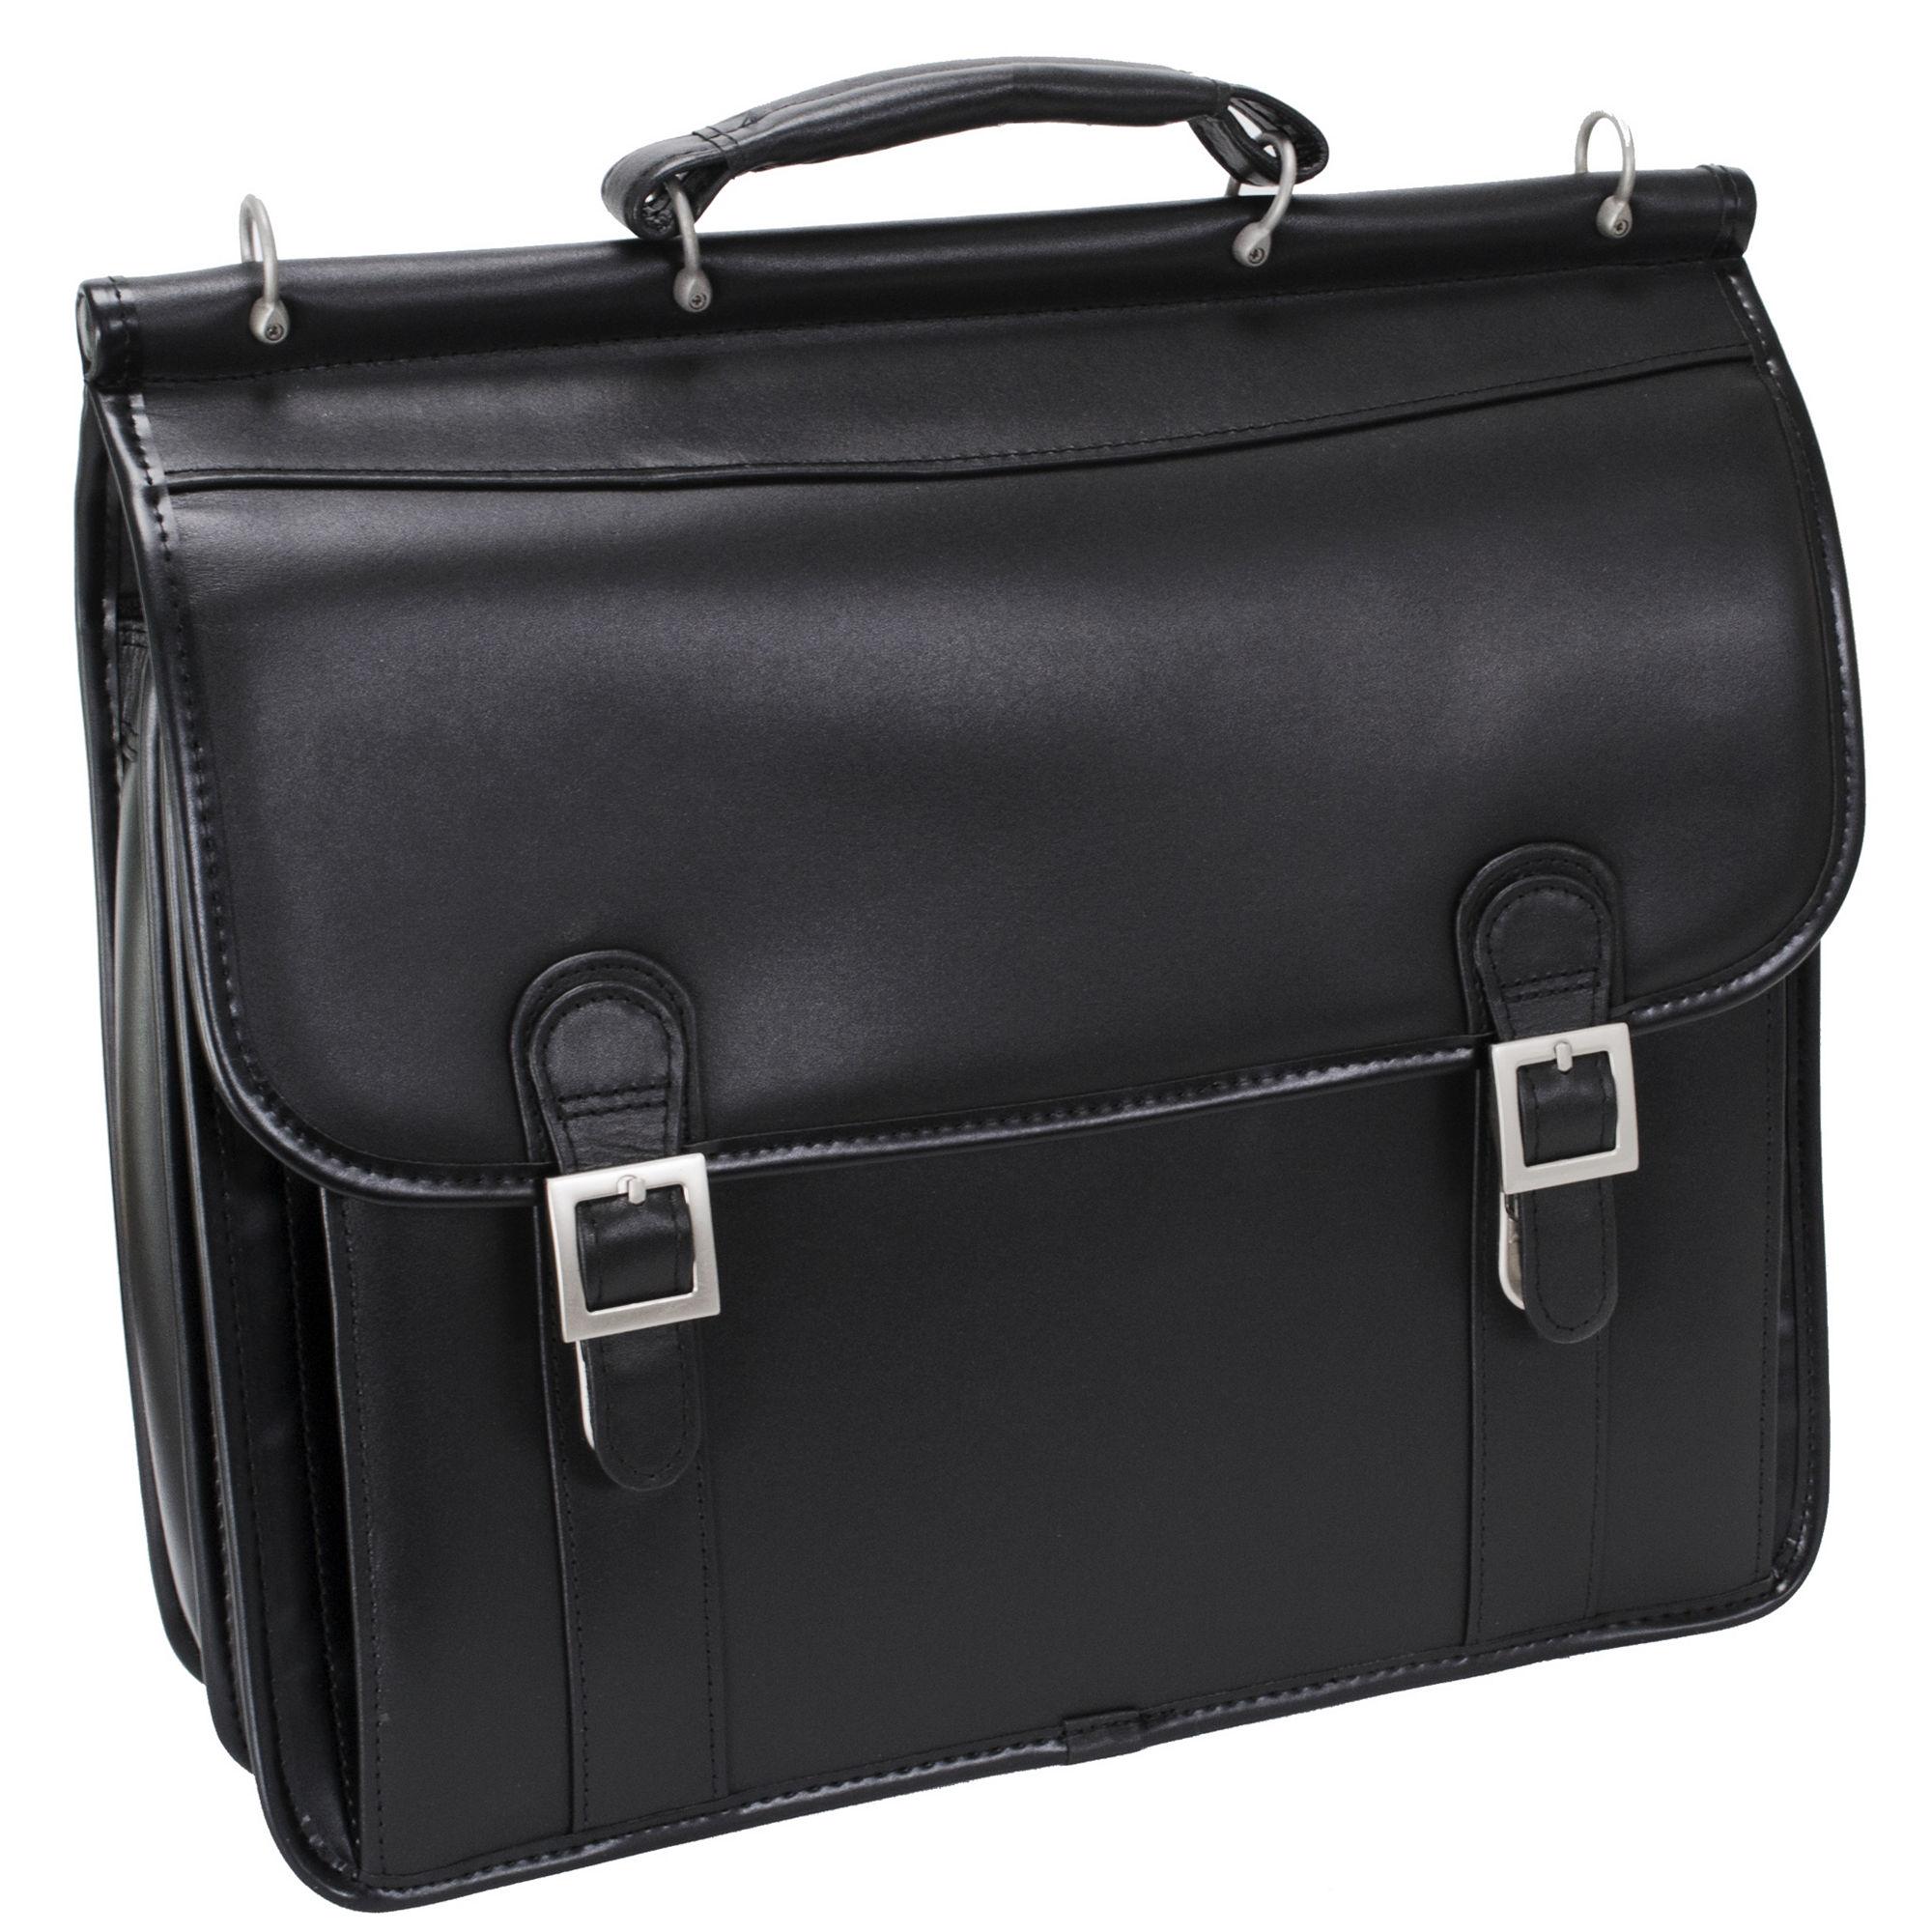 "McKlein Halsted 15.5"" Double Compartment Laptop Case"